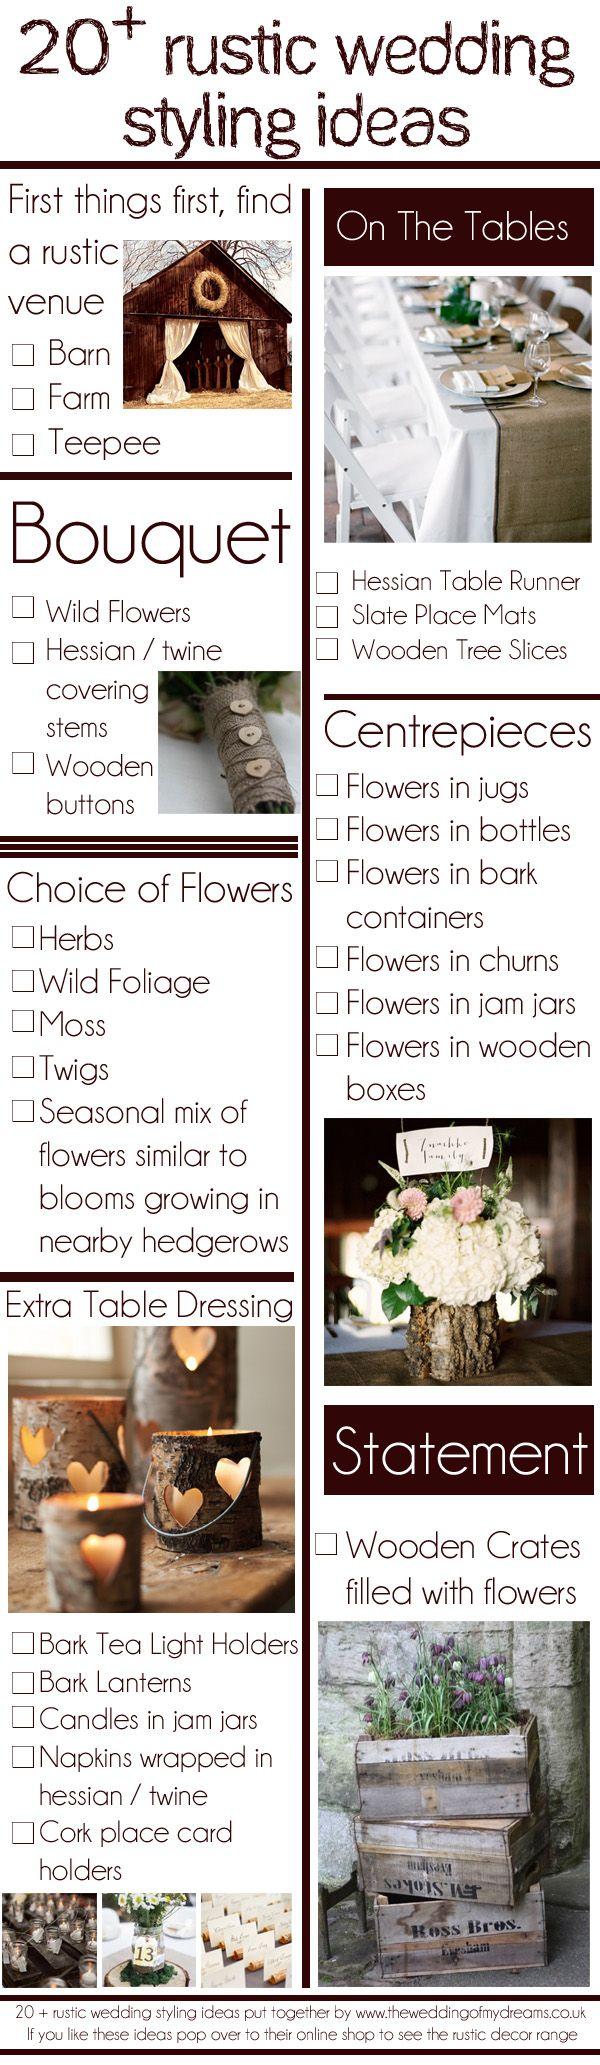 Wedding decorations checklist   Wedding Checklist Templates for Rustic Beach and Outdoor Weddings